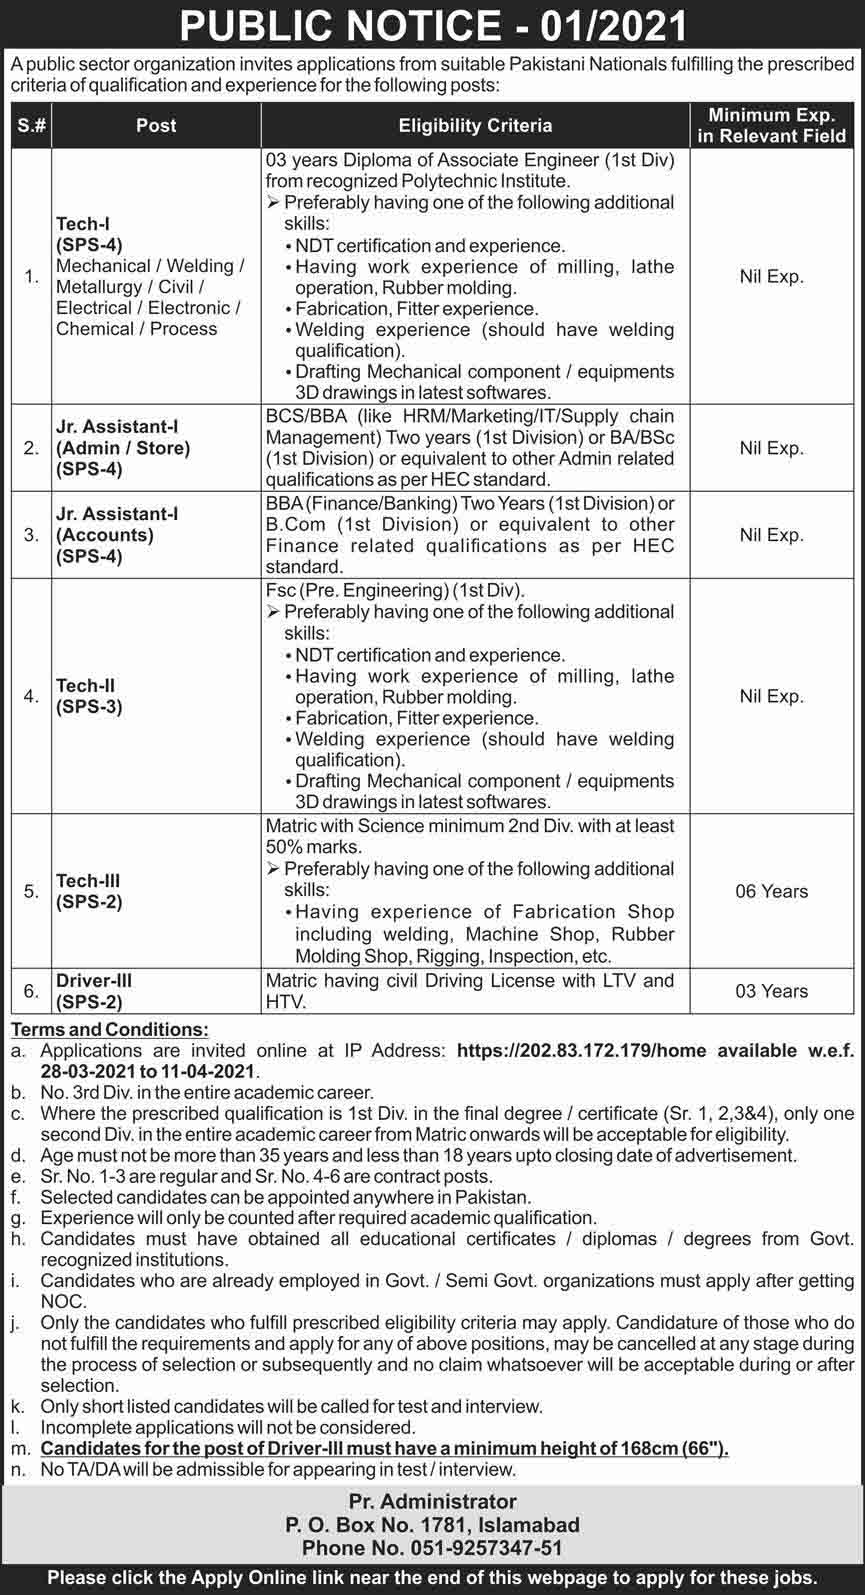 Public Sector Organization PO Box 1781 Islamabad Jobs March 2021